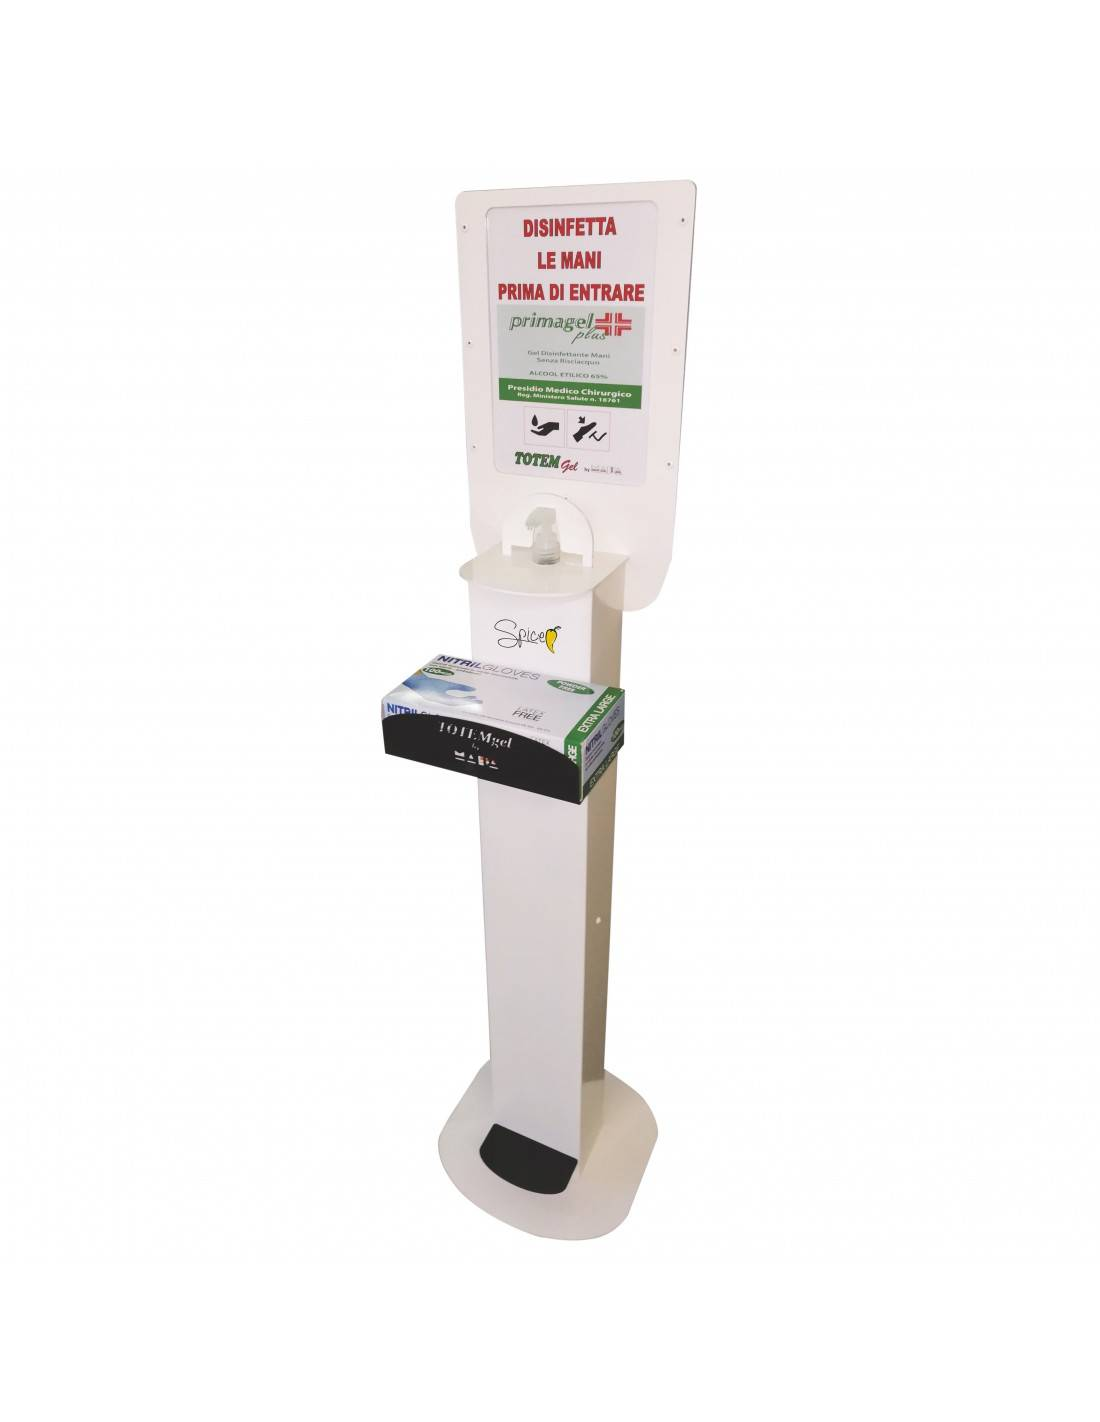 spice electronics totem gel premium by mapa - porta dispenser gel disinfettante mani